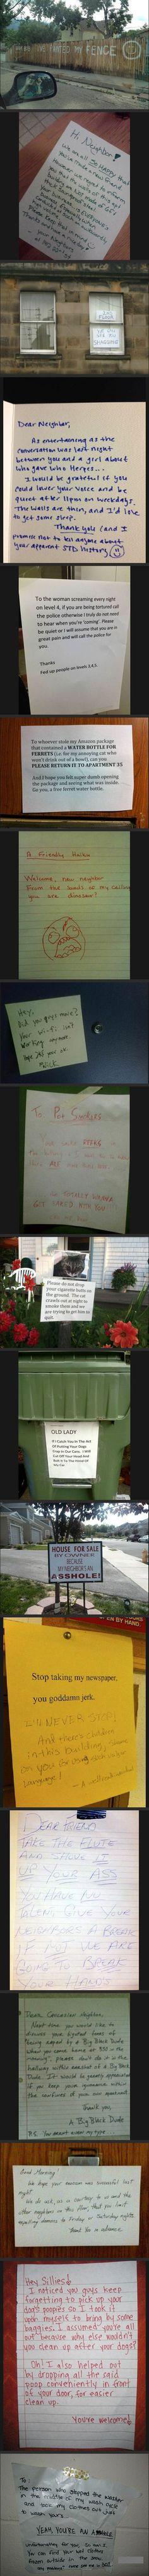 Hysterically funny Read More Funny: http://wdb.es/?utm_campaign=wdb.es&utm_medium=pinterest&utm_source=pinterst-description&utm_content=&utm_term=